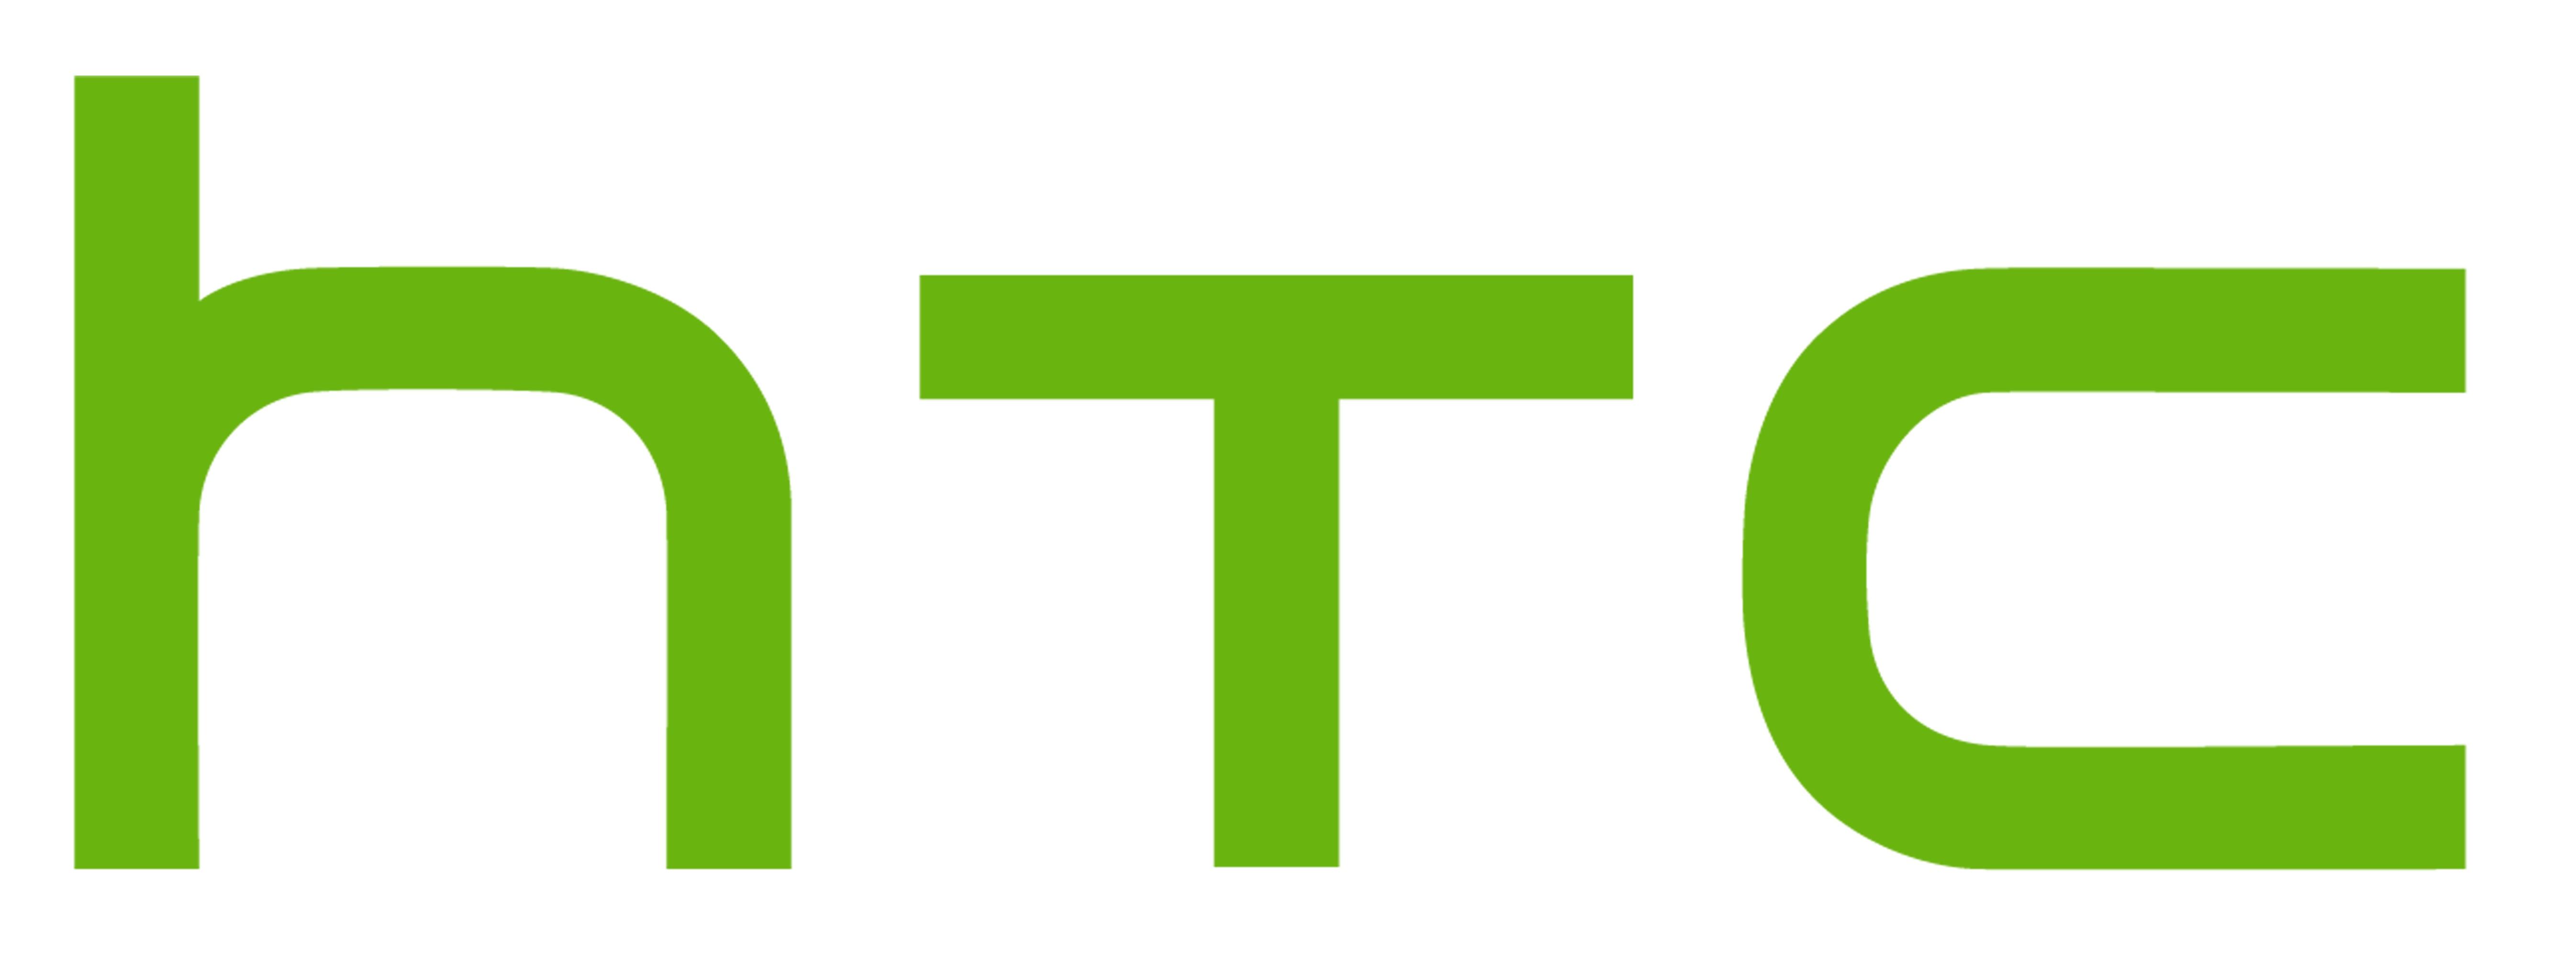 htc logo png #430